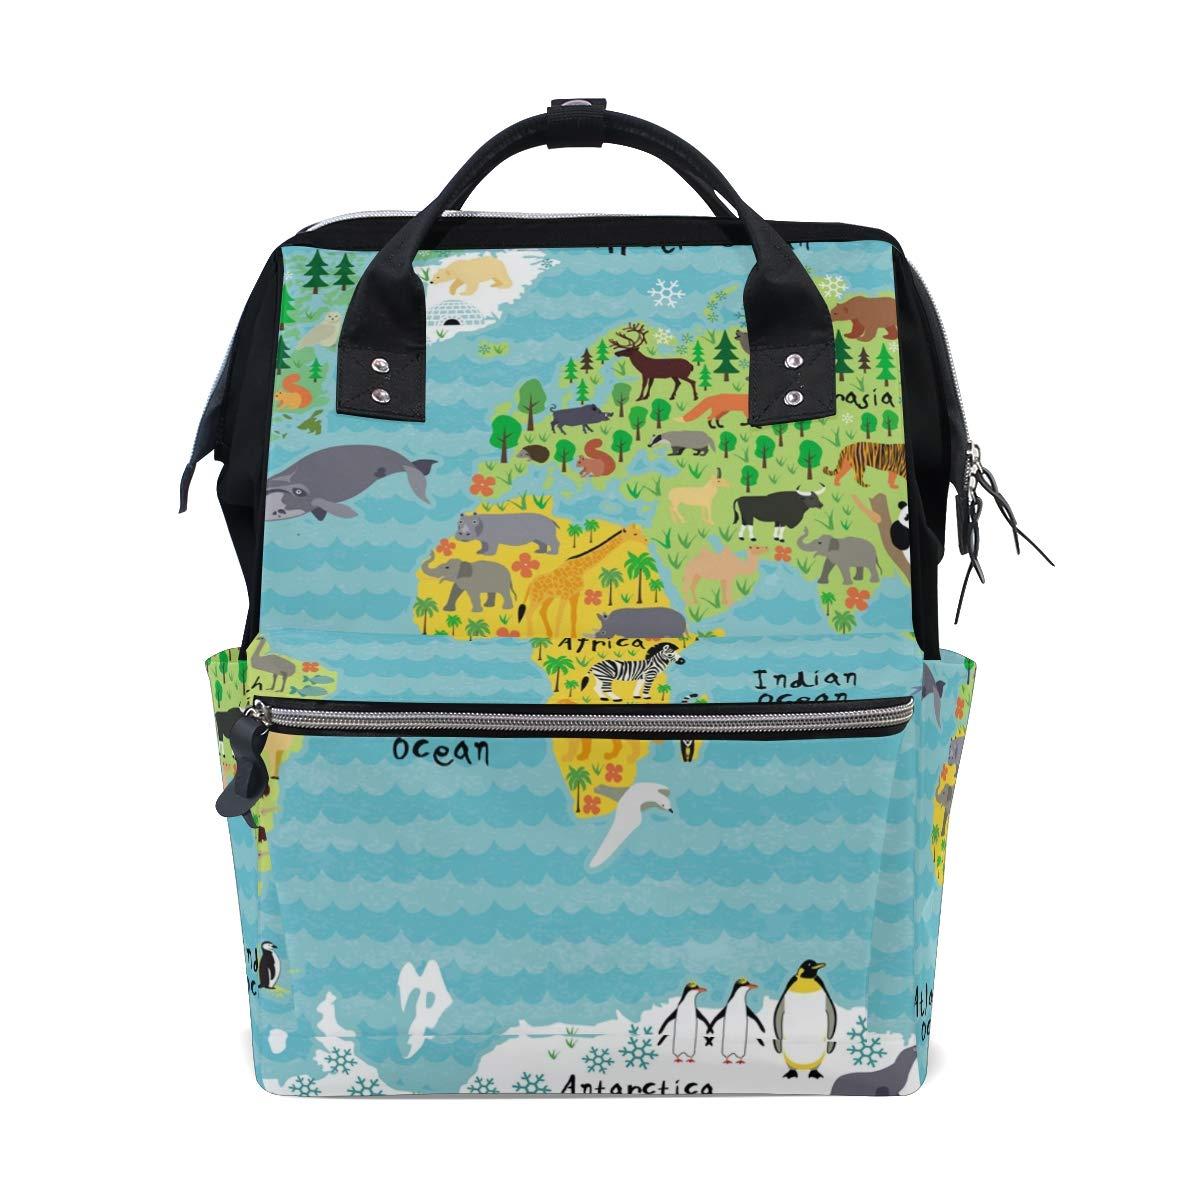 MERRYSUGAR Diaper Bag School Backpack Baby Bag World Map Animal Blue Large Multifunction Travel Bag Mommy Bag